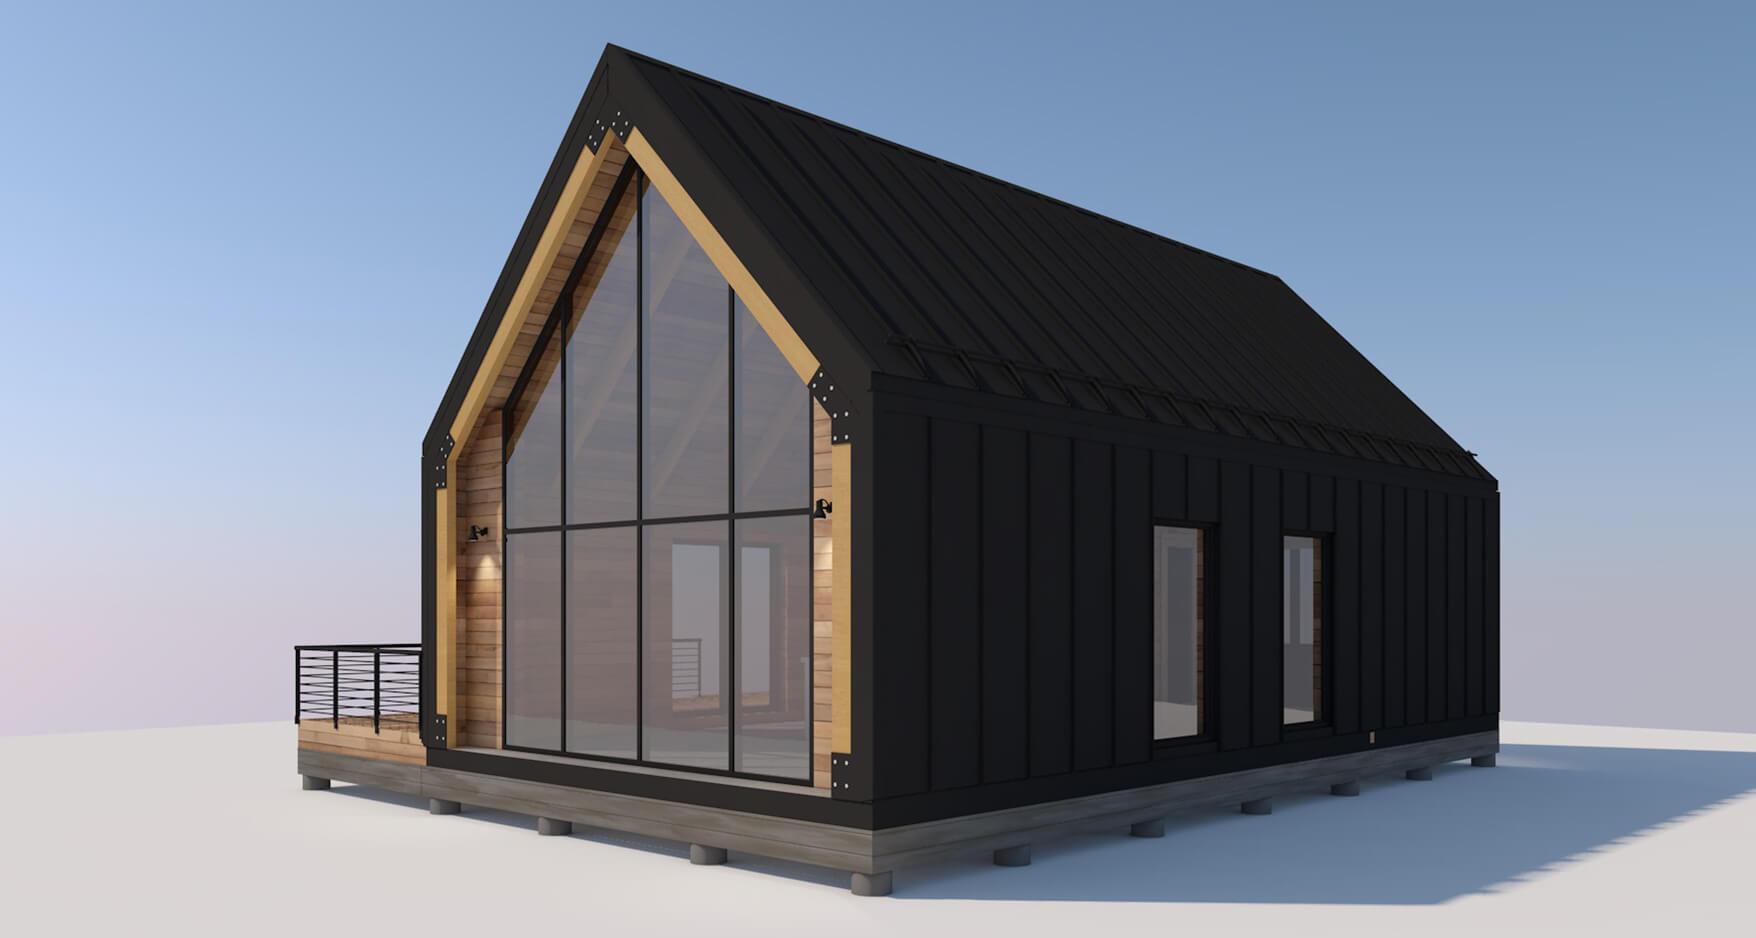 На фото: проект каркасного дома площадью 112 М² / Источник фото: prostohouse.com